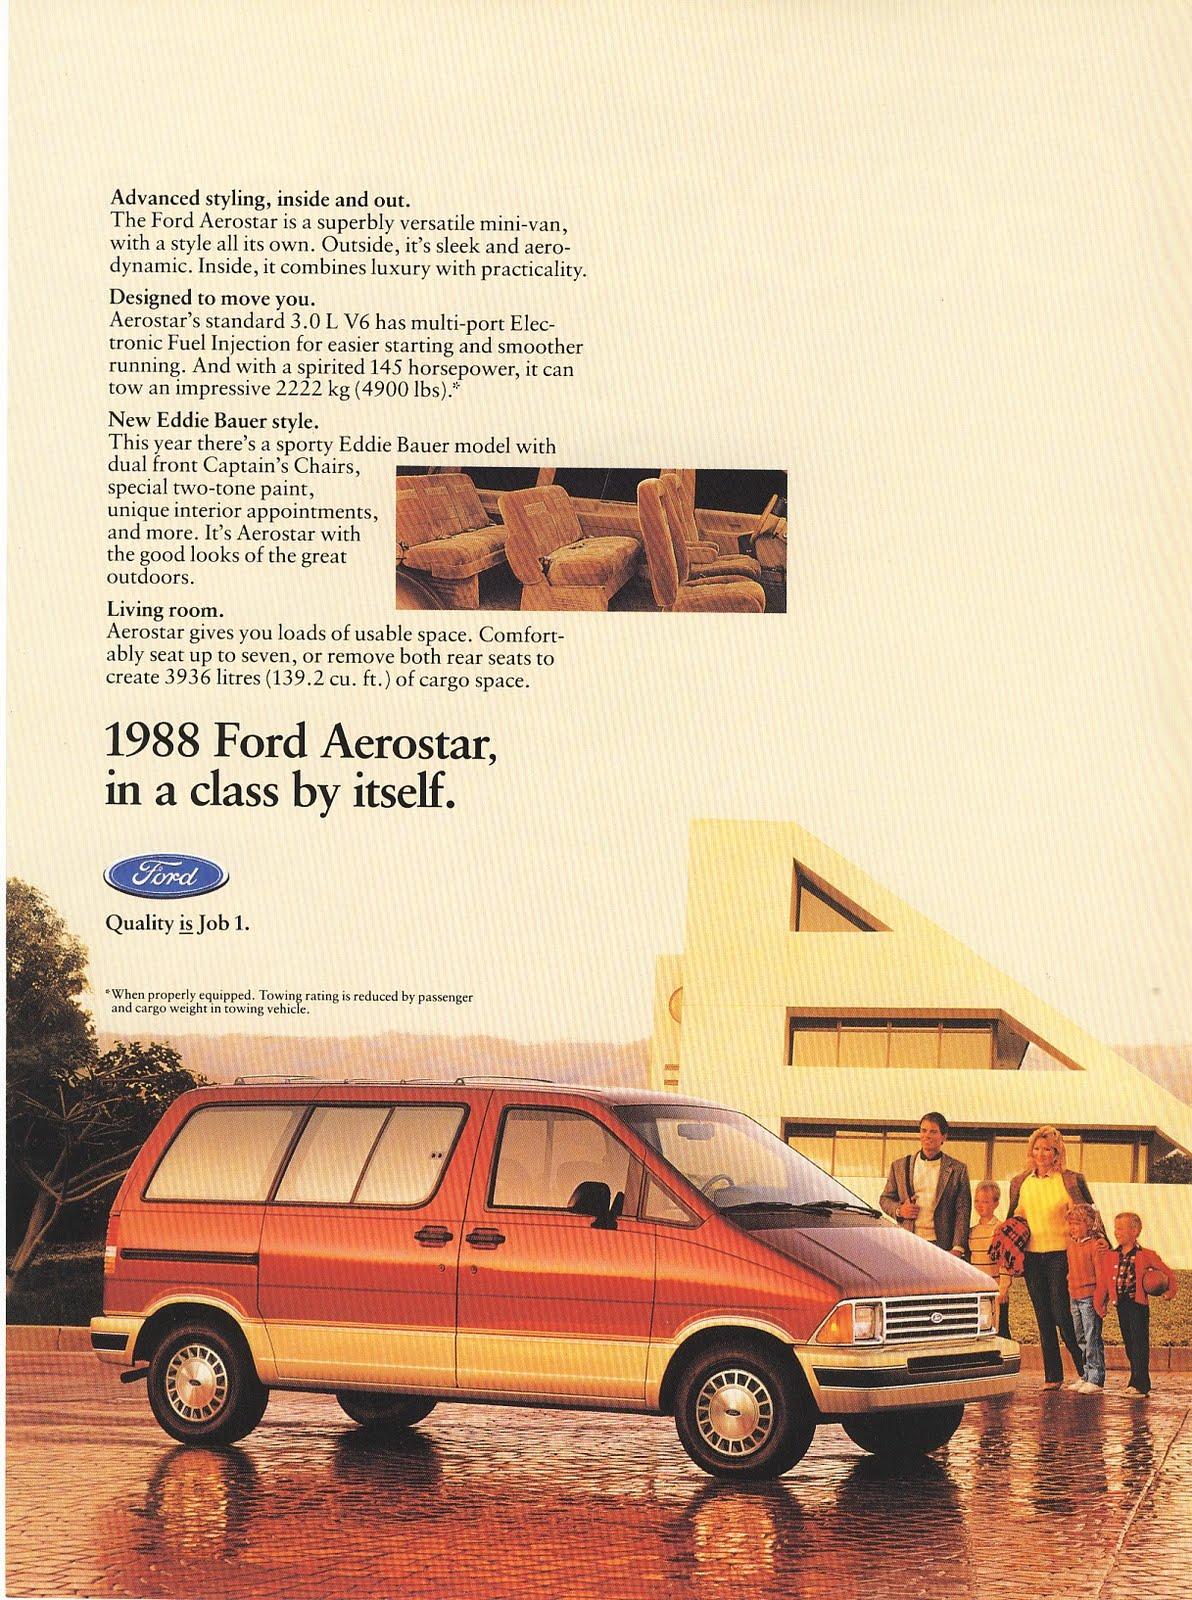 1988 - FORD AEROSTAR - Magazine Ad - FAMILY VAN - Photo | Old ...